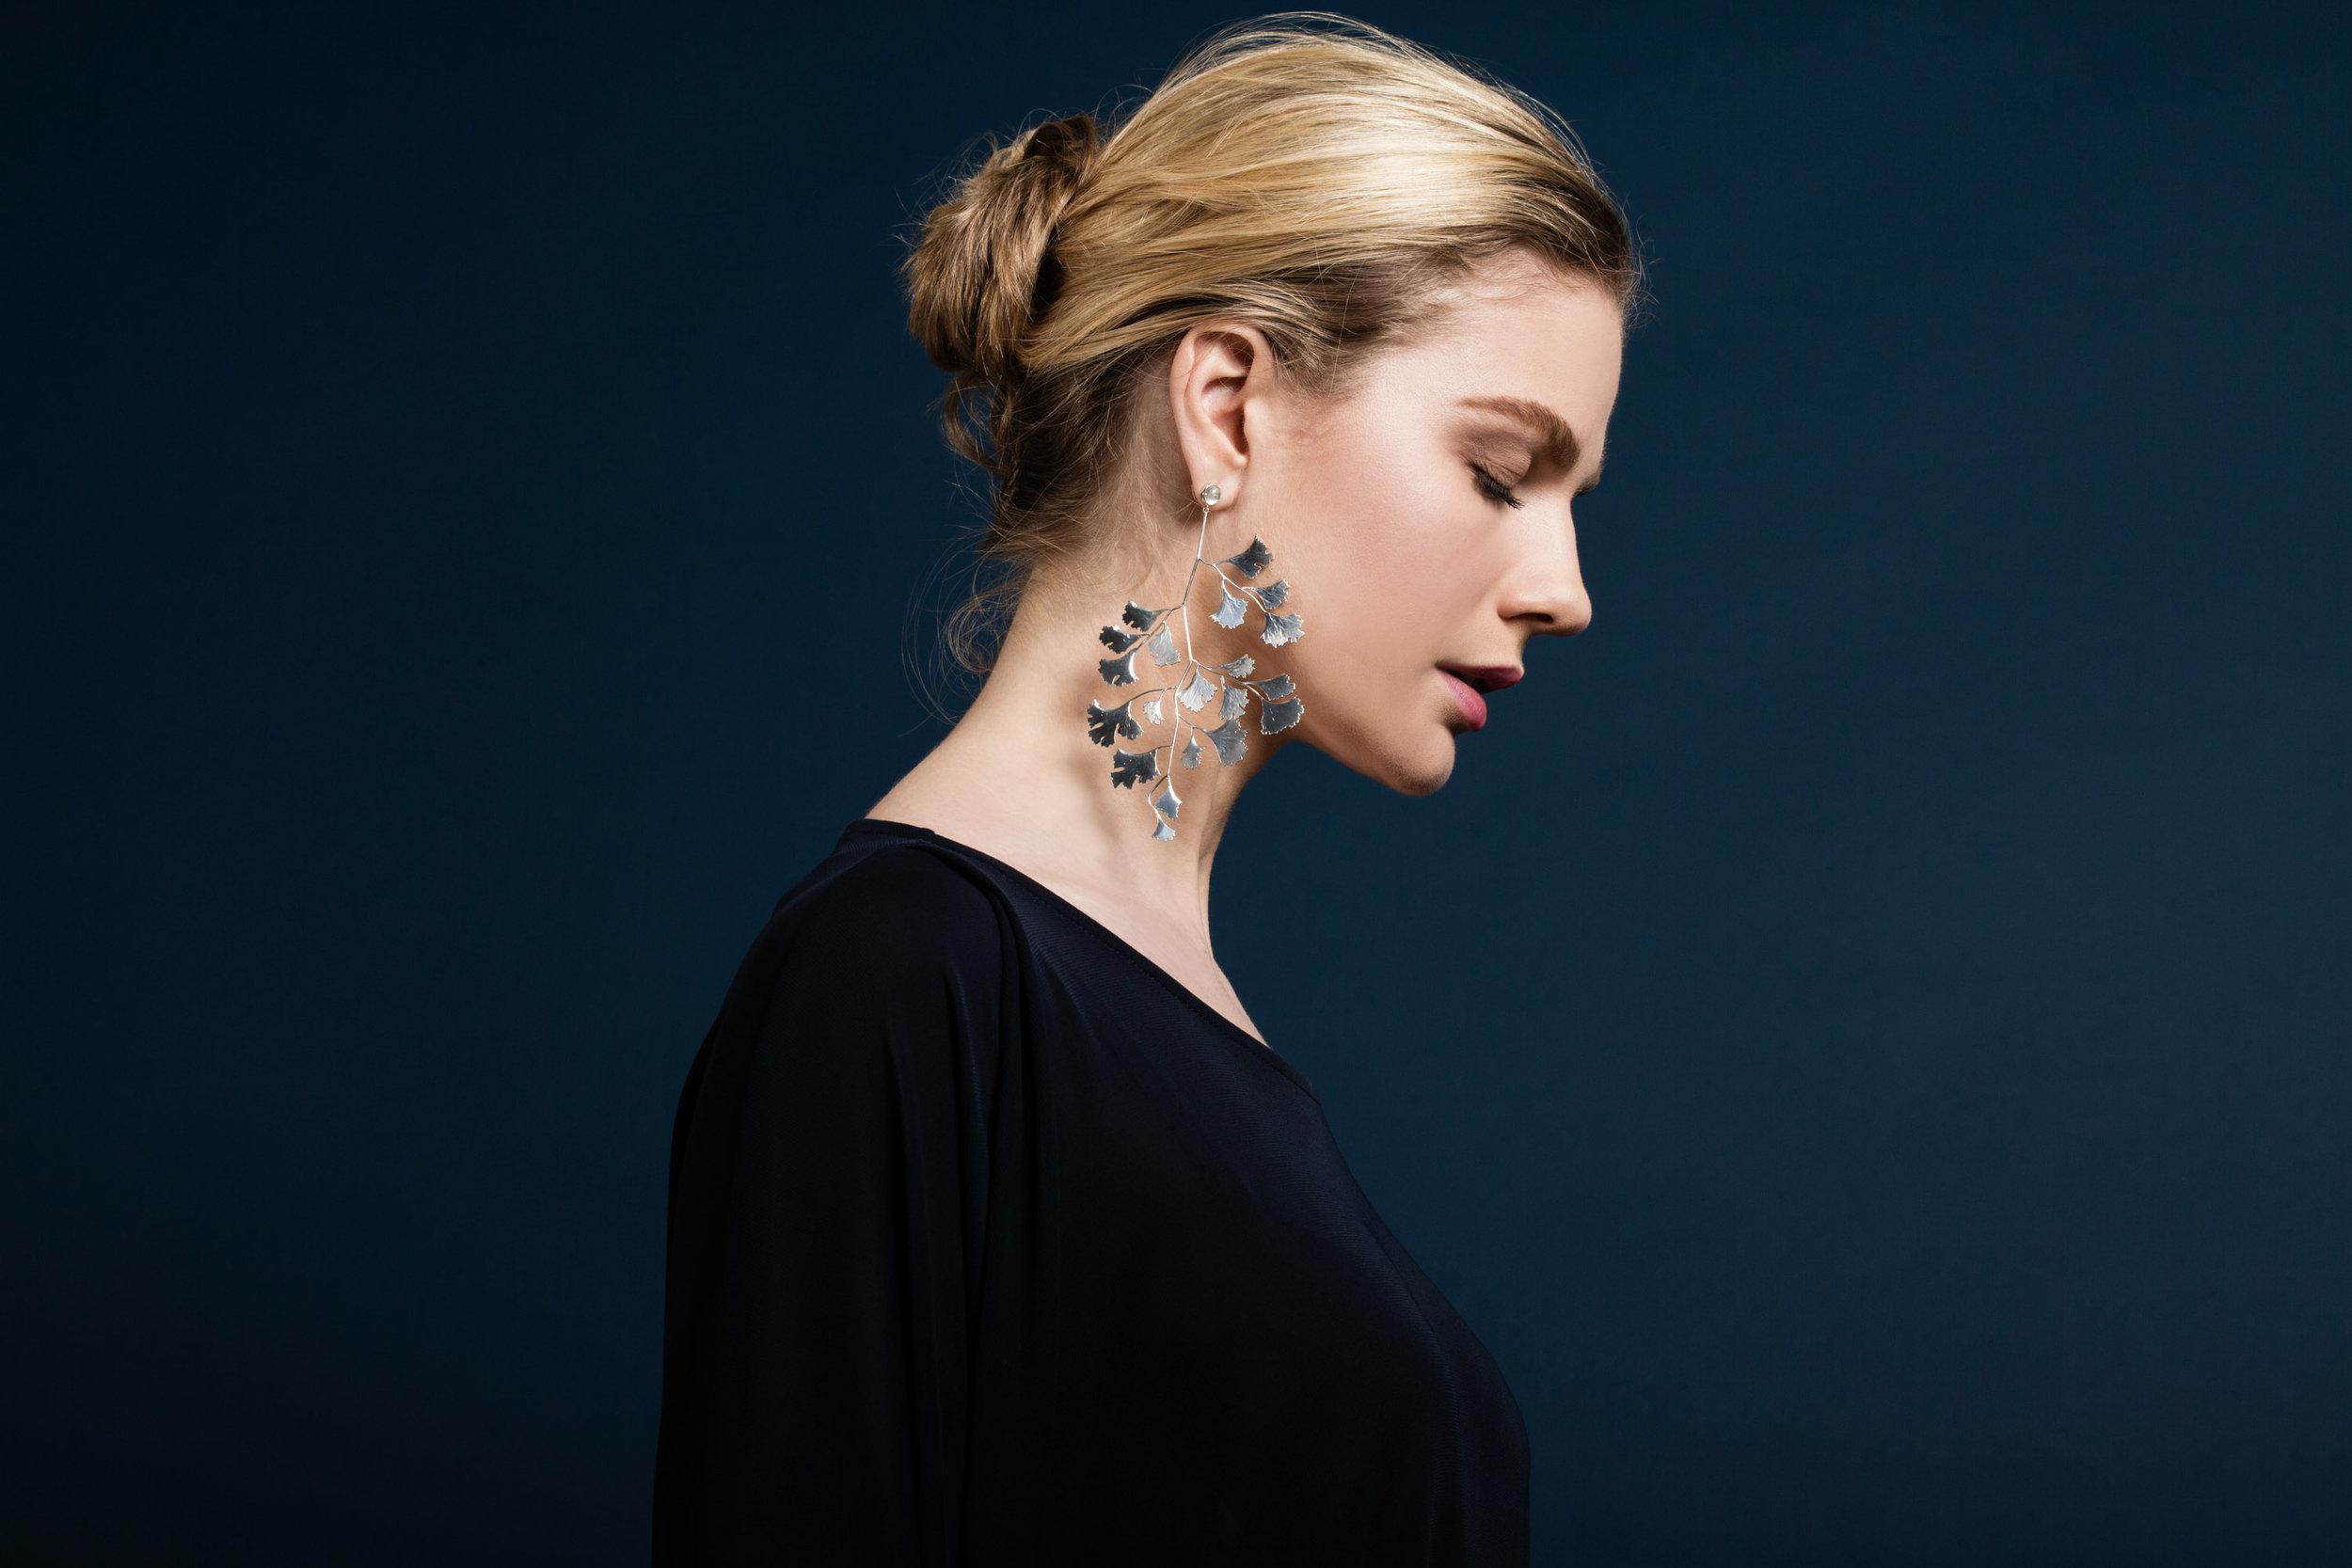 Ginko leaf earrings, silver moonstones